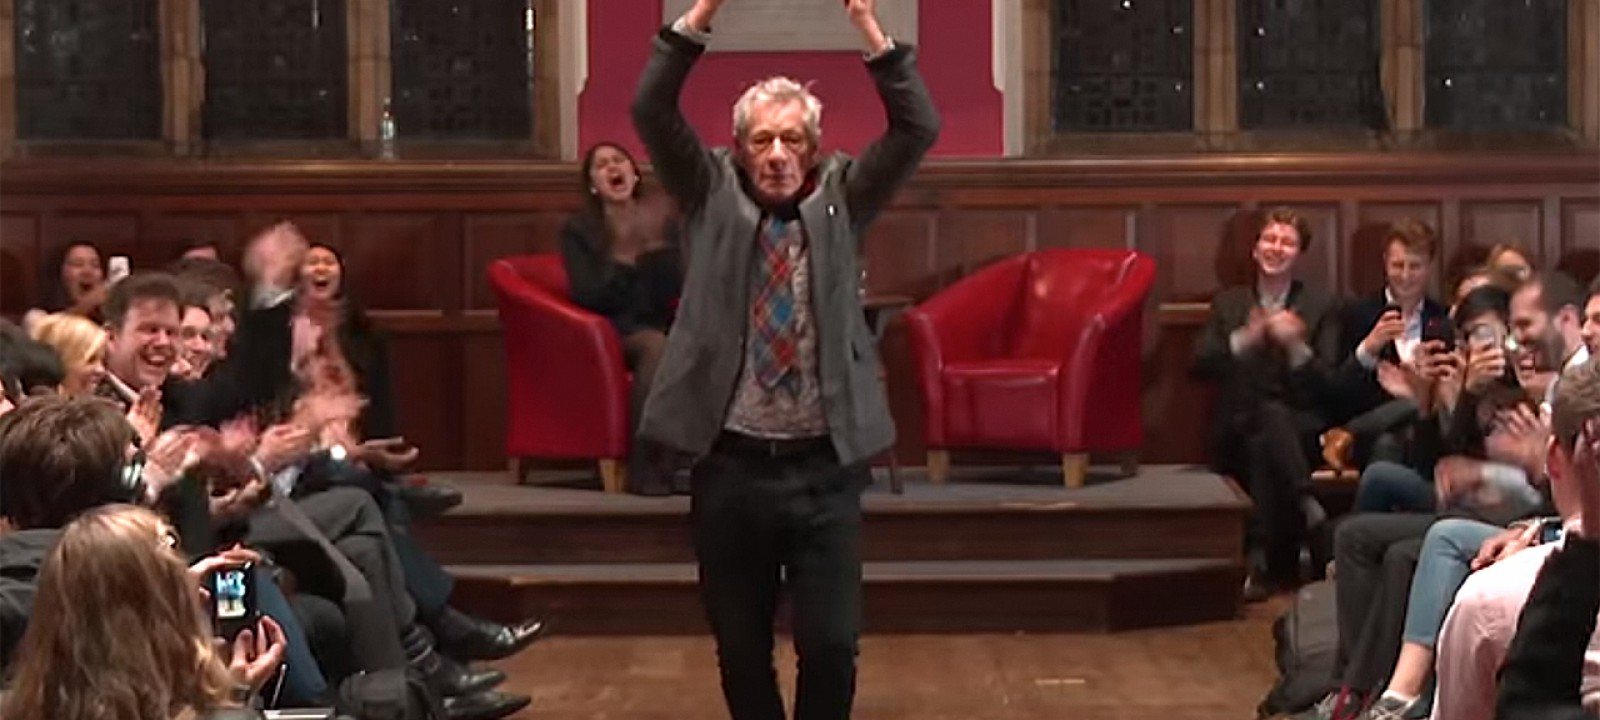 Sir Ian McKellen at Oxford Union (Photo: Oxford Union)